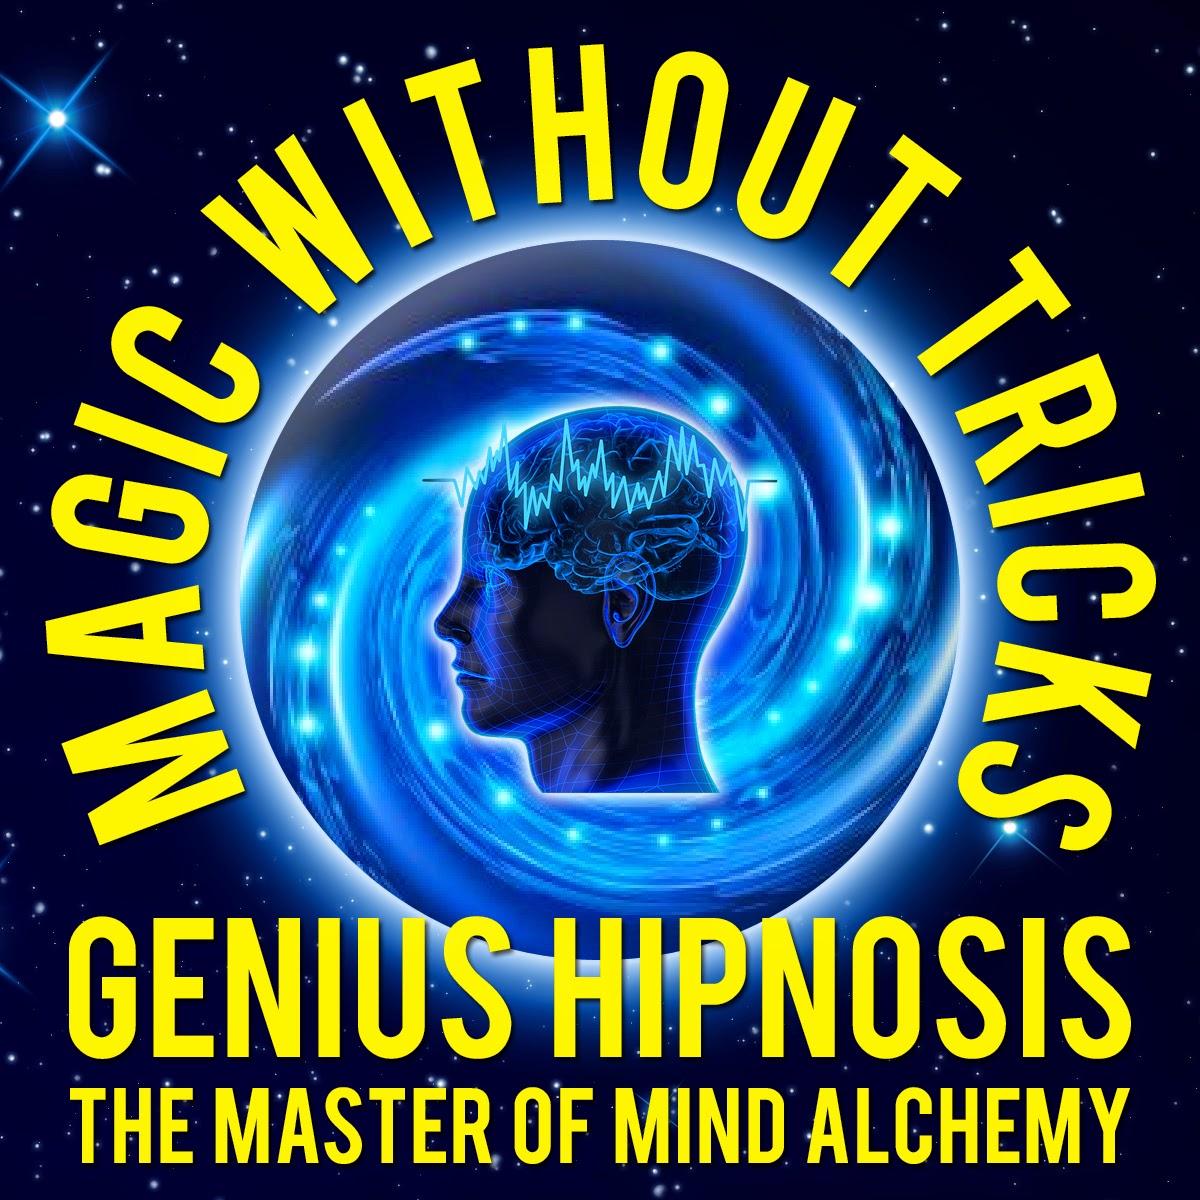 Hipnotis Adalah Sulap Tanpa Trick